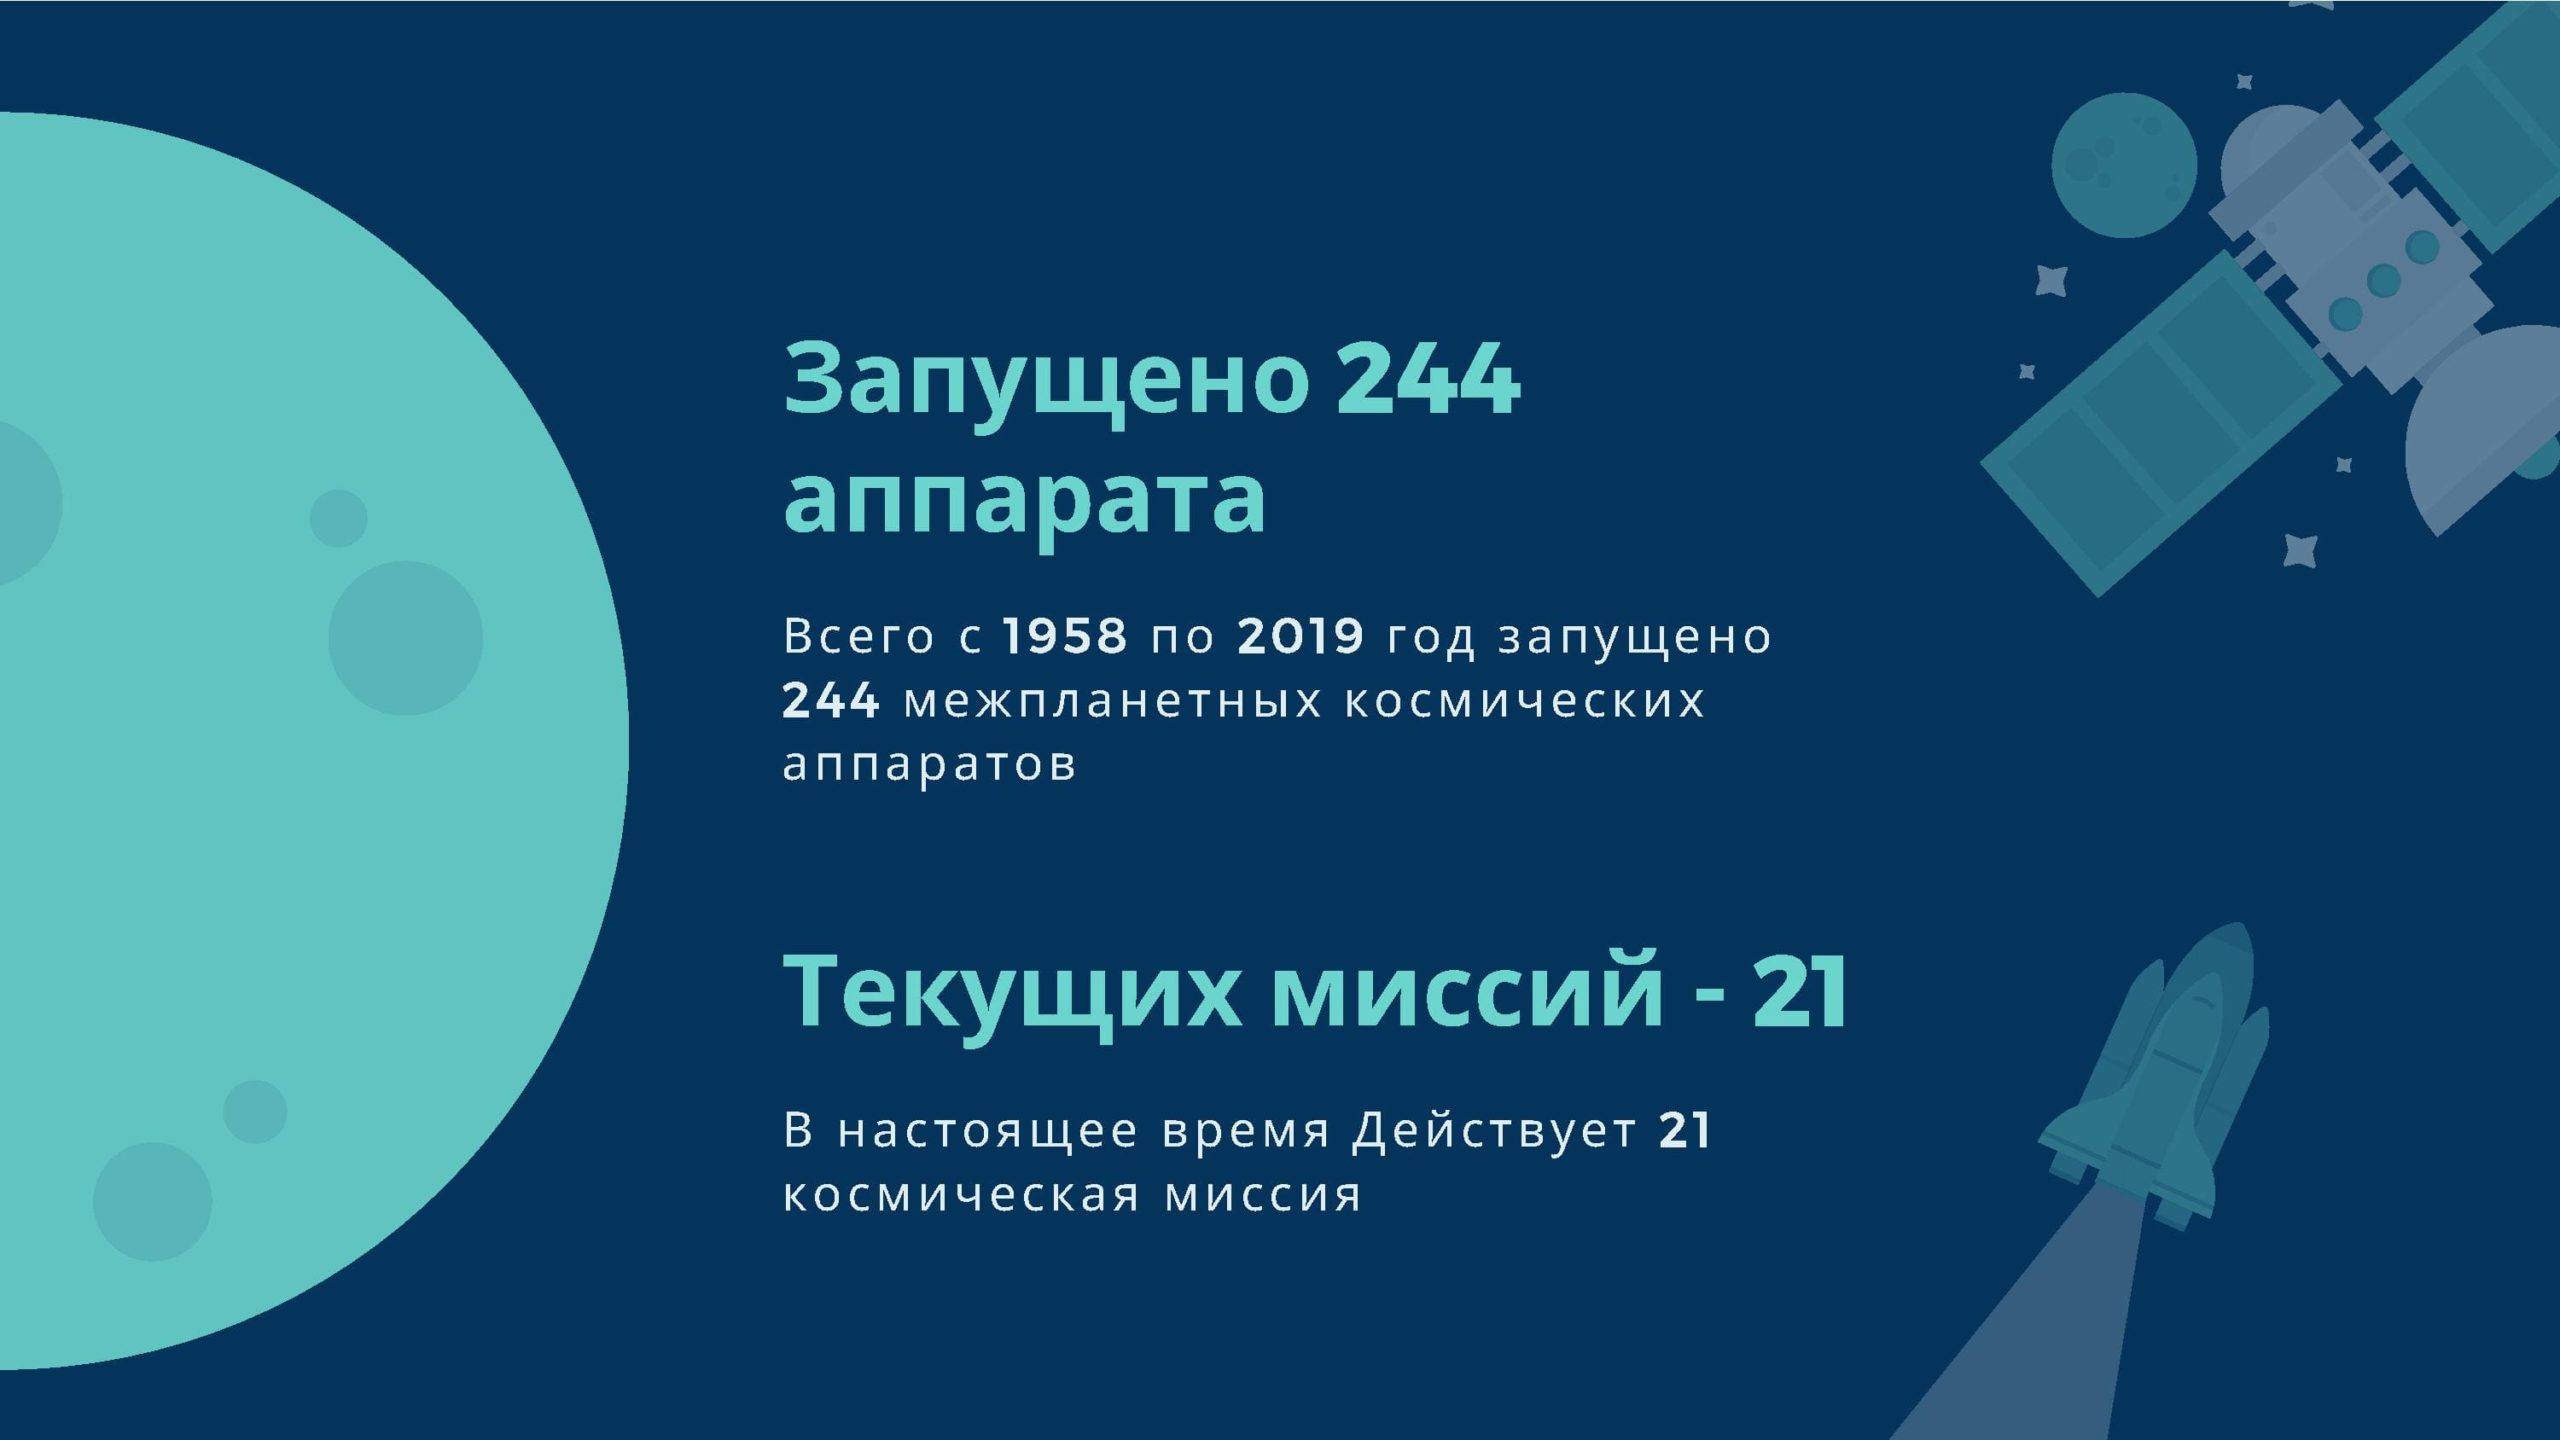 Запущено 244 аппарата. Текущих миссий 21